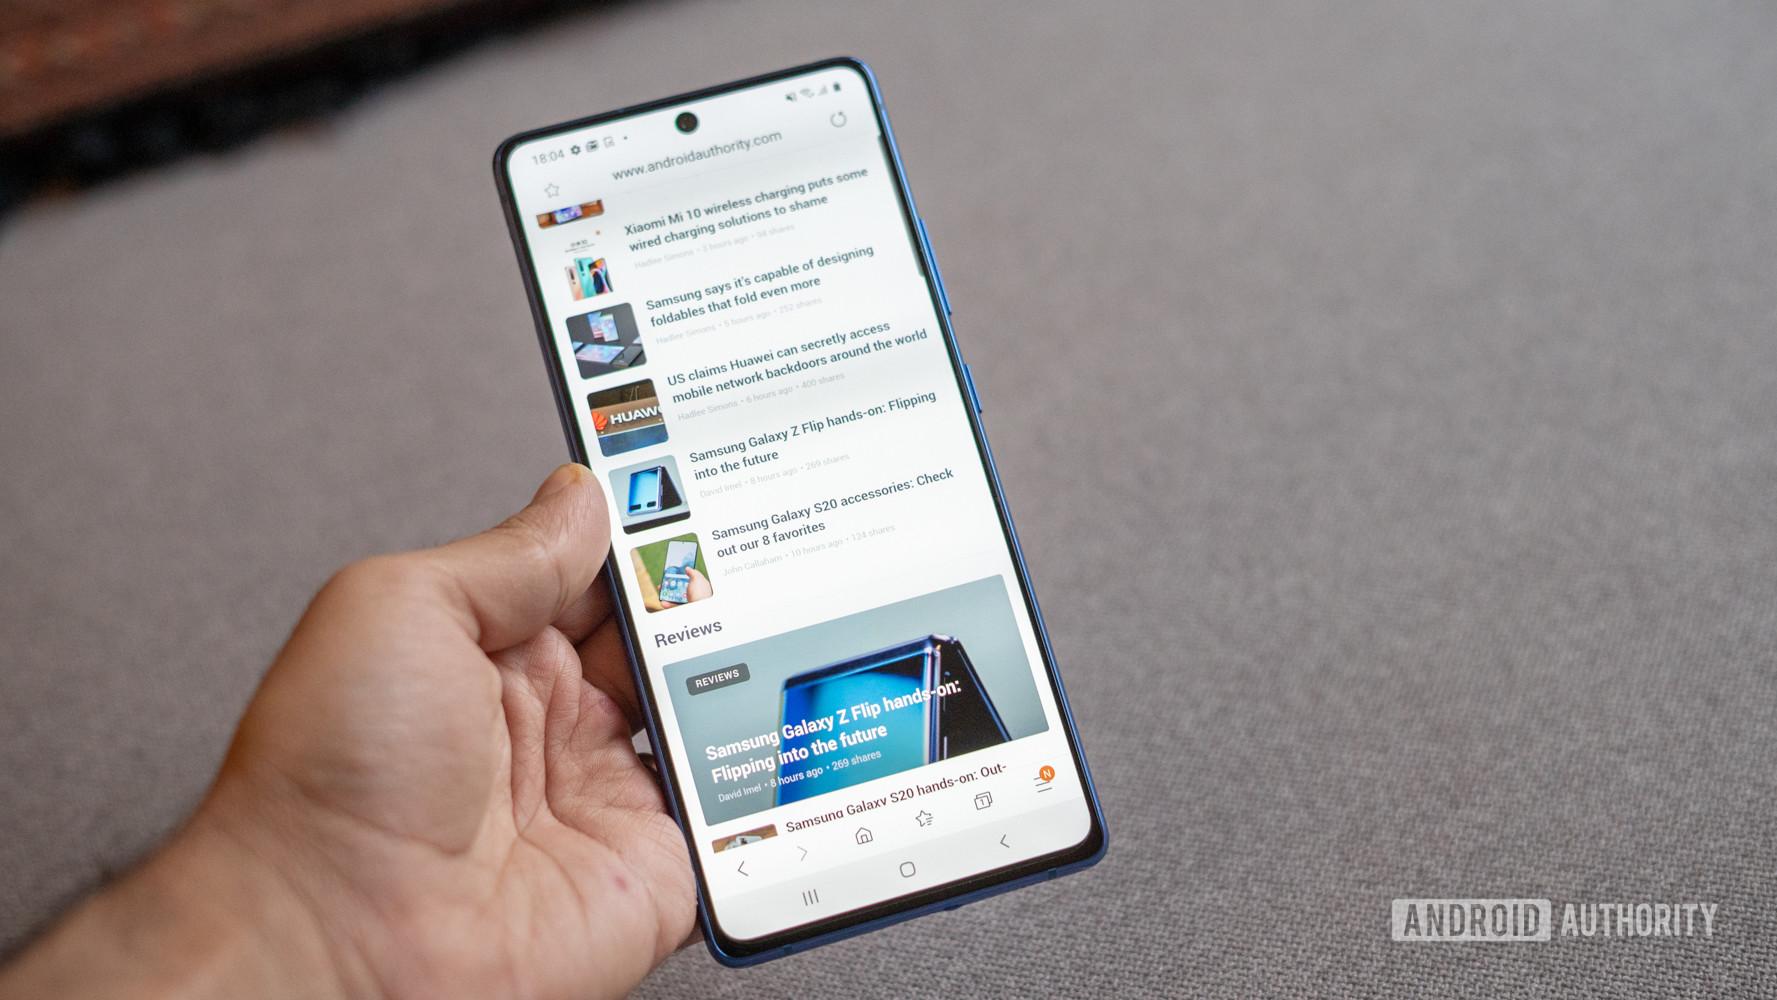 Samsung Galaxy S10 Lite in hand showing browser